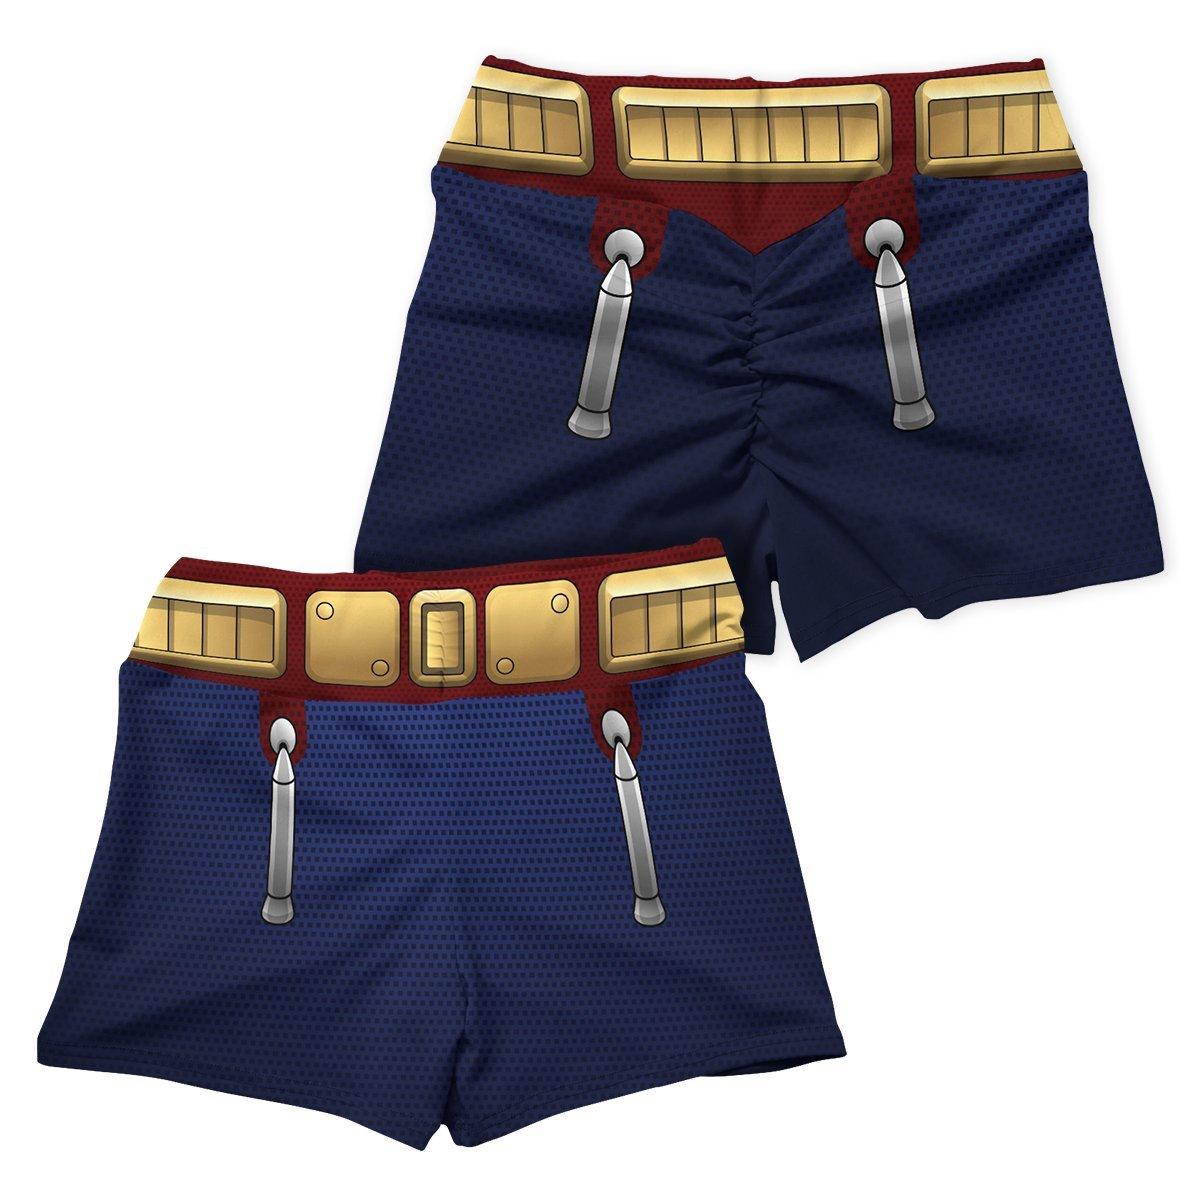 ua high shoto active wear set 498663 - Anime Swimsuits